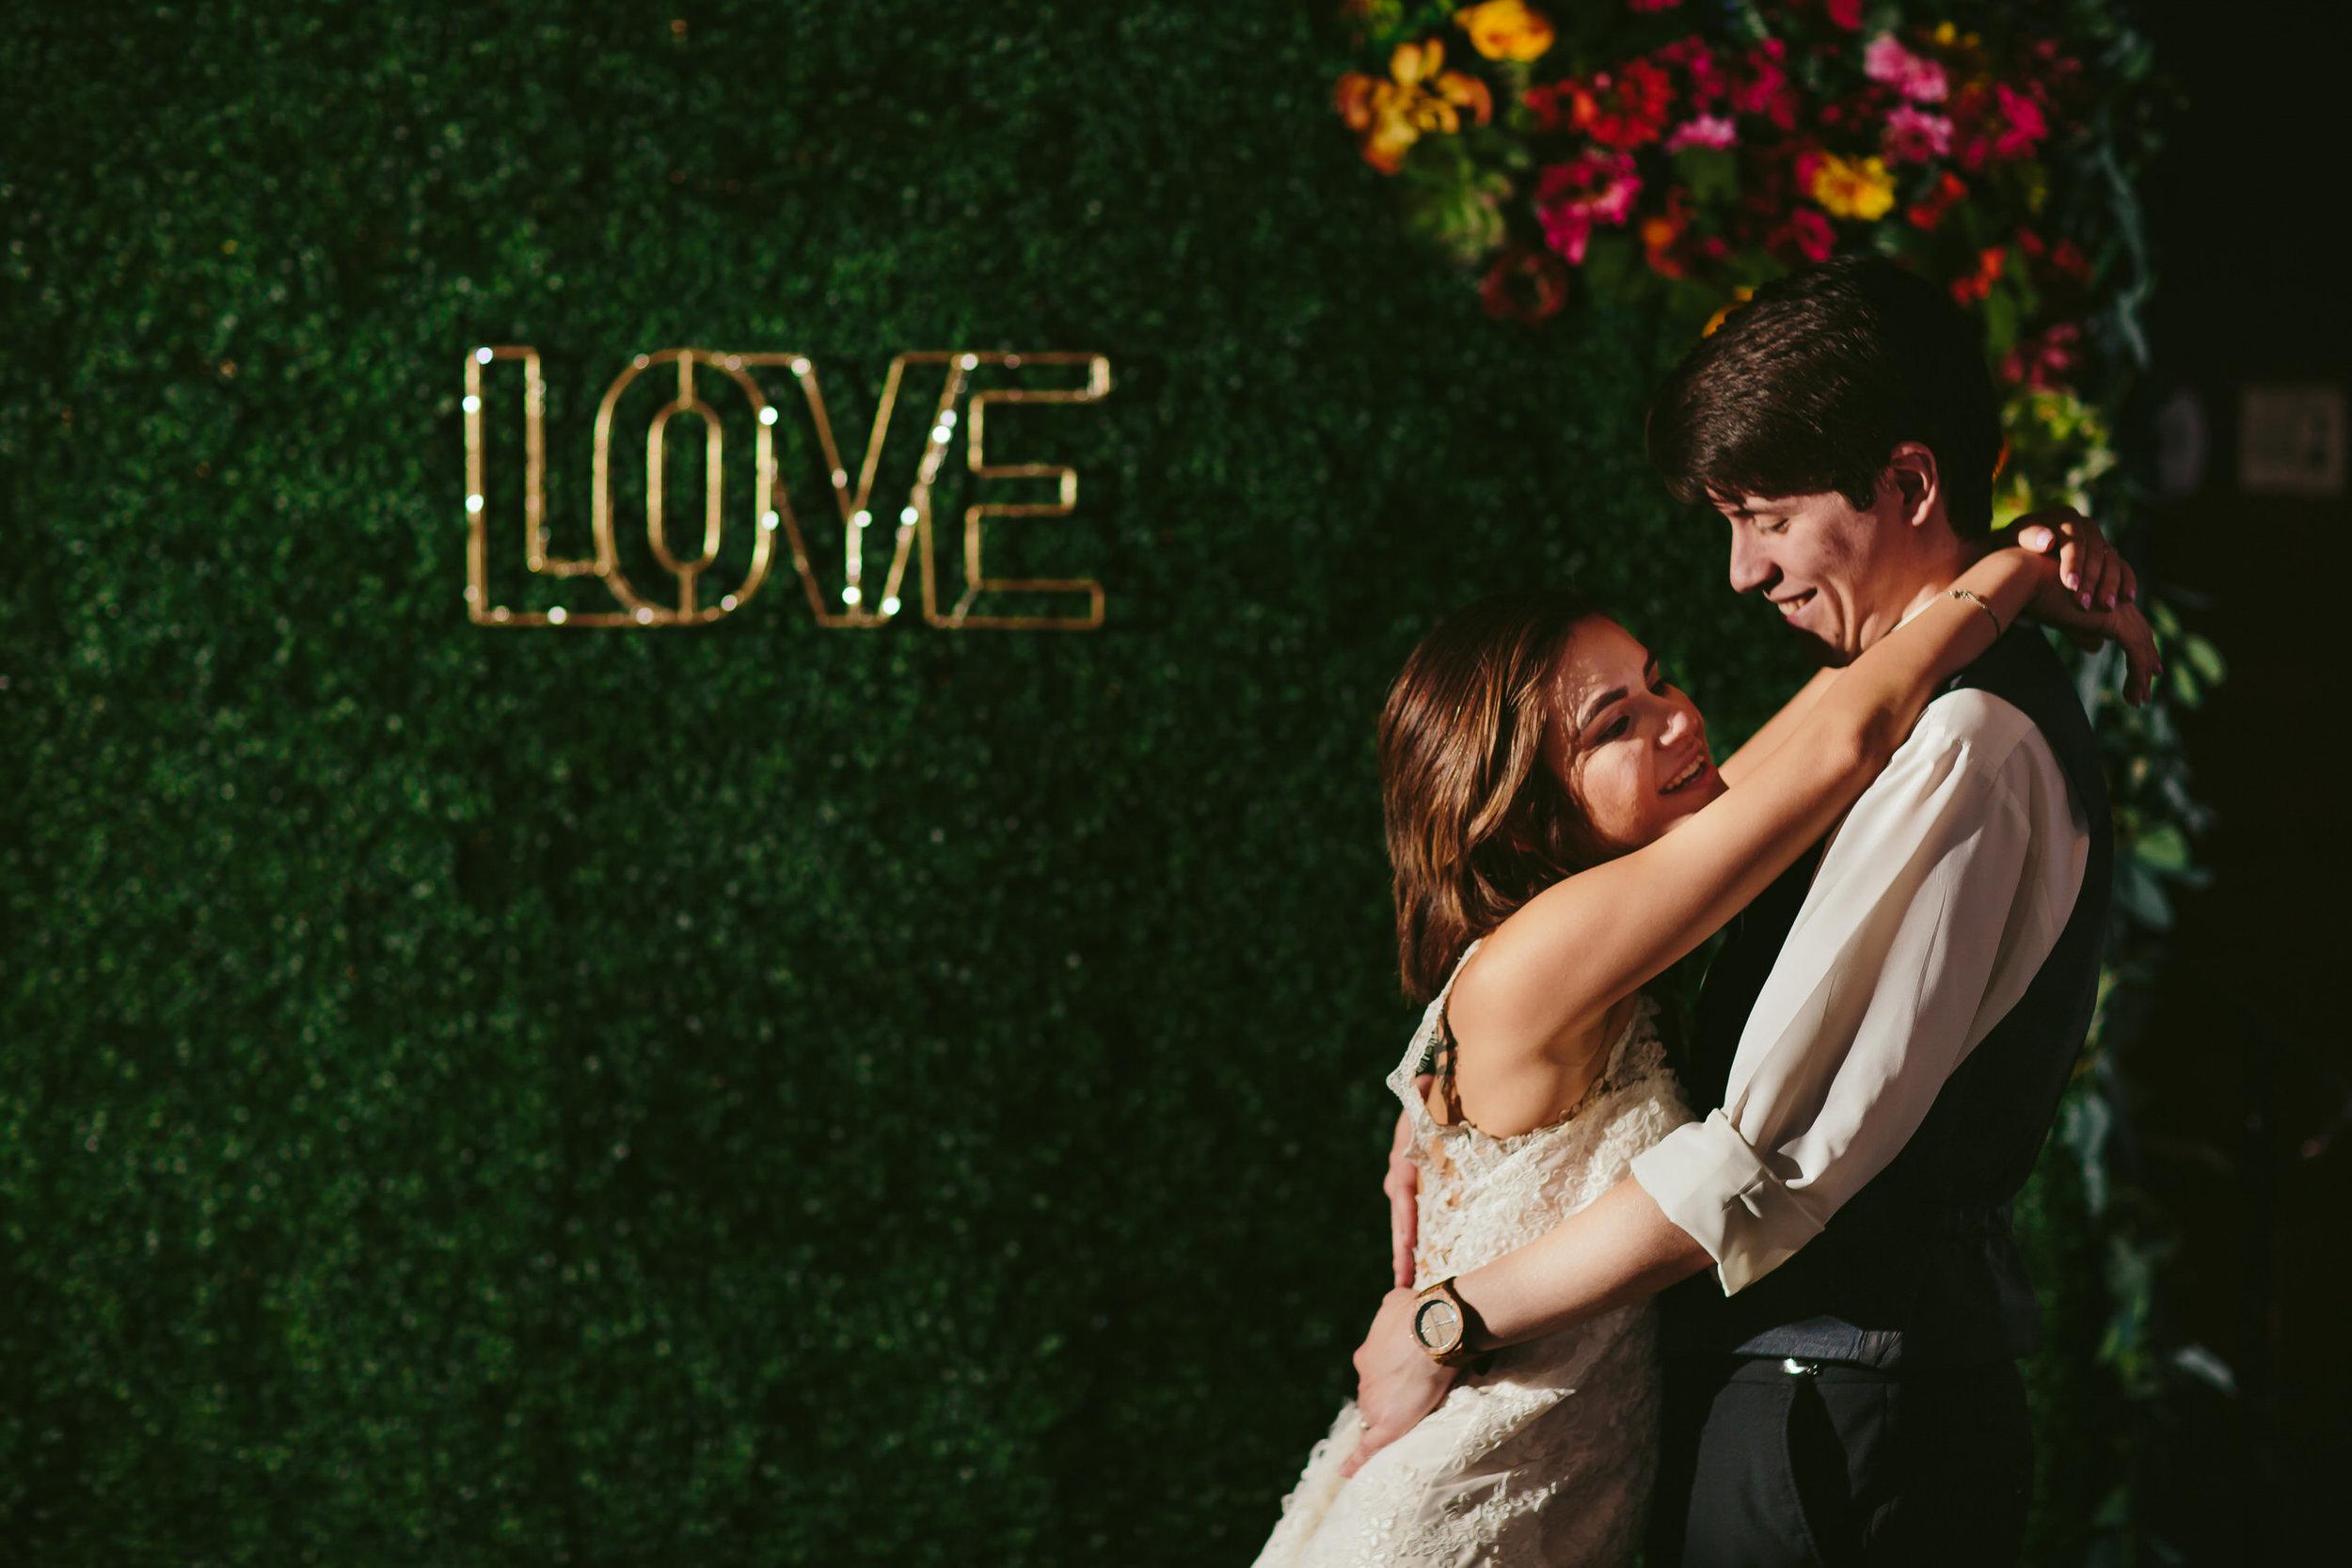 love_wedding_reception_tiny_house_photo_rustic_weddings.jpg